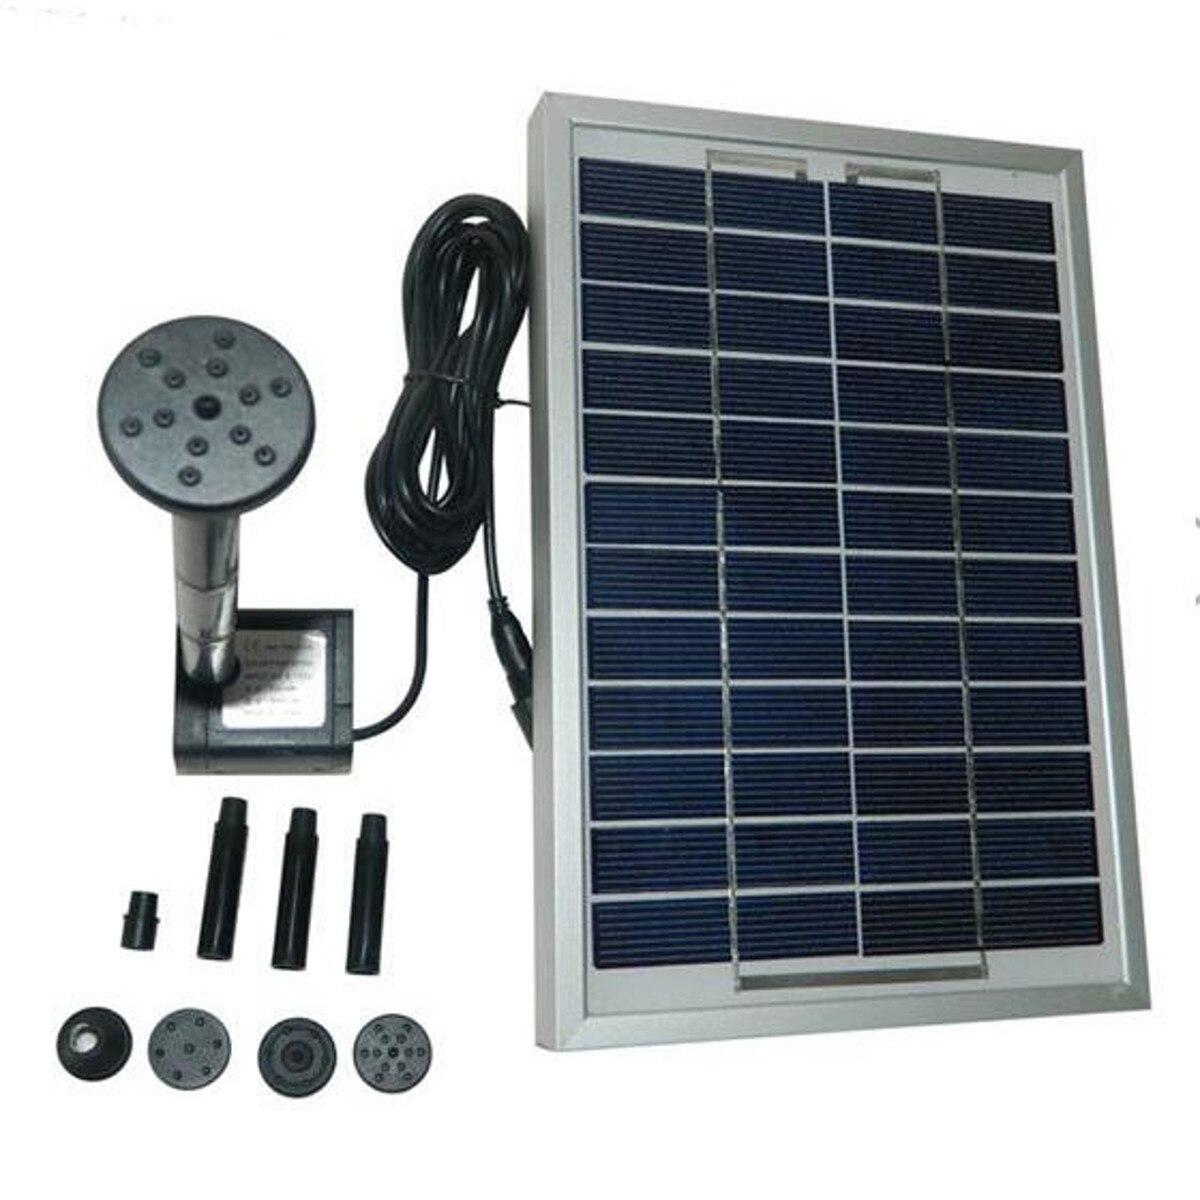 12 V 5 W 380l/h Solar Power Mini Fontein Pomp Tuin Landschap Dc Borstelloze Waterpomp